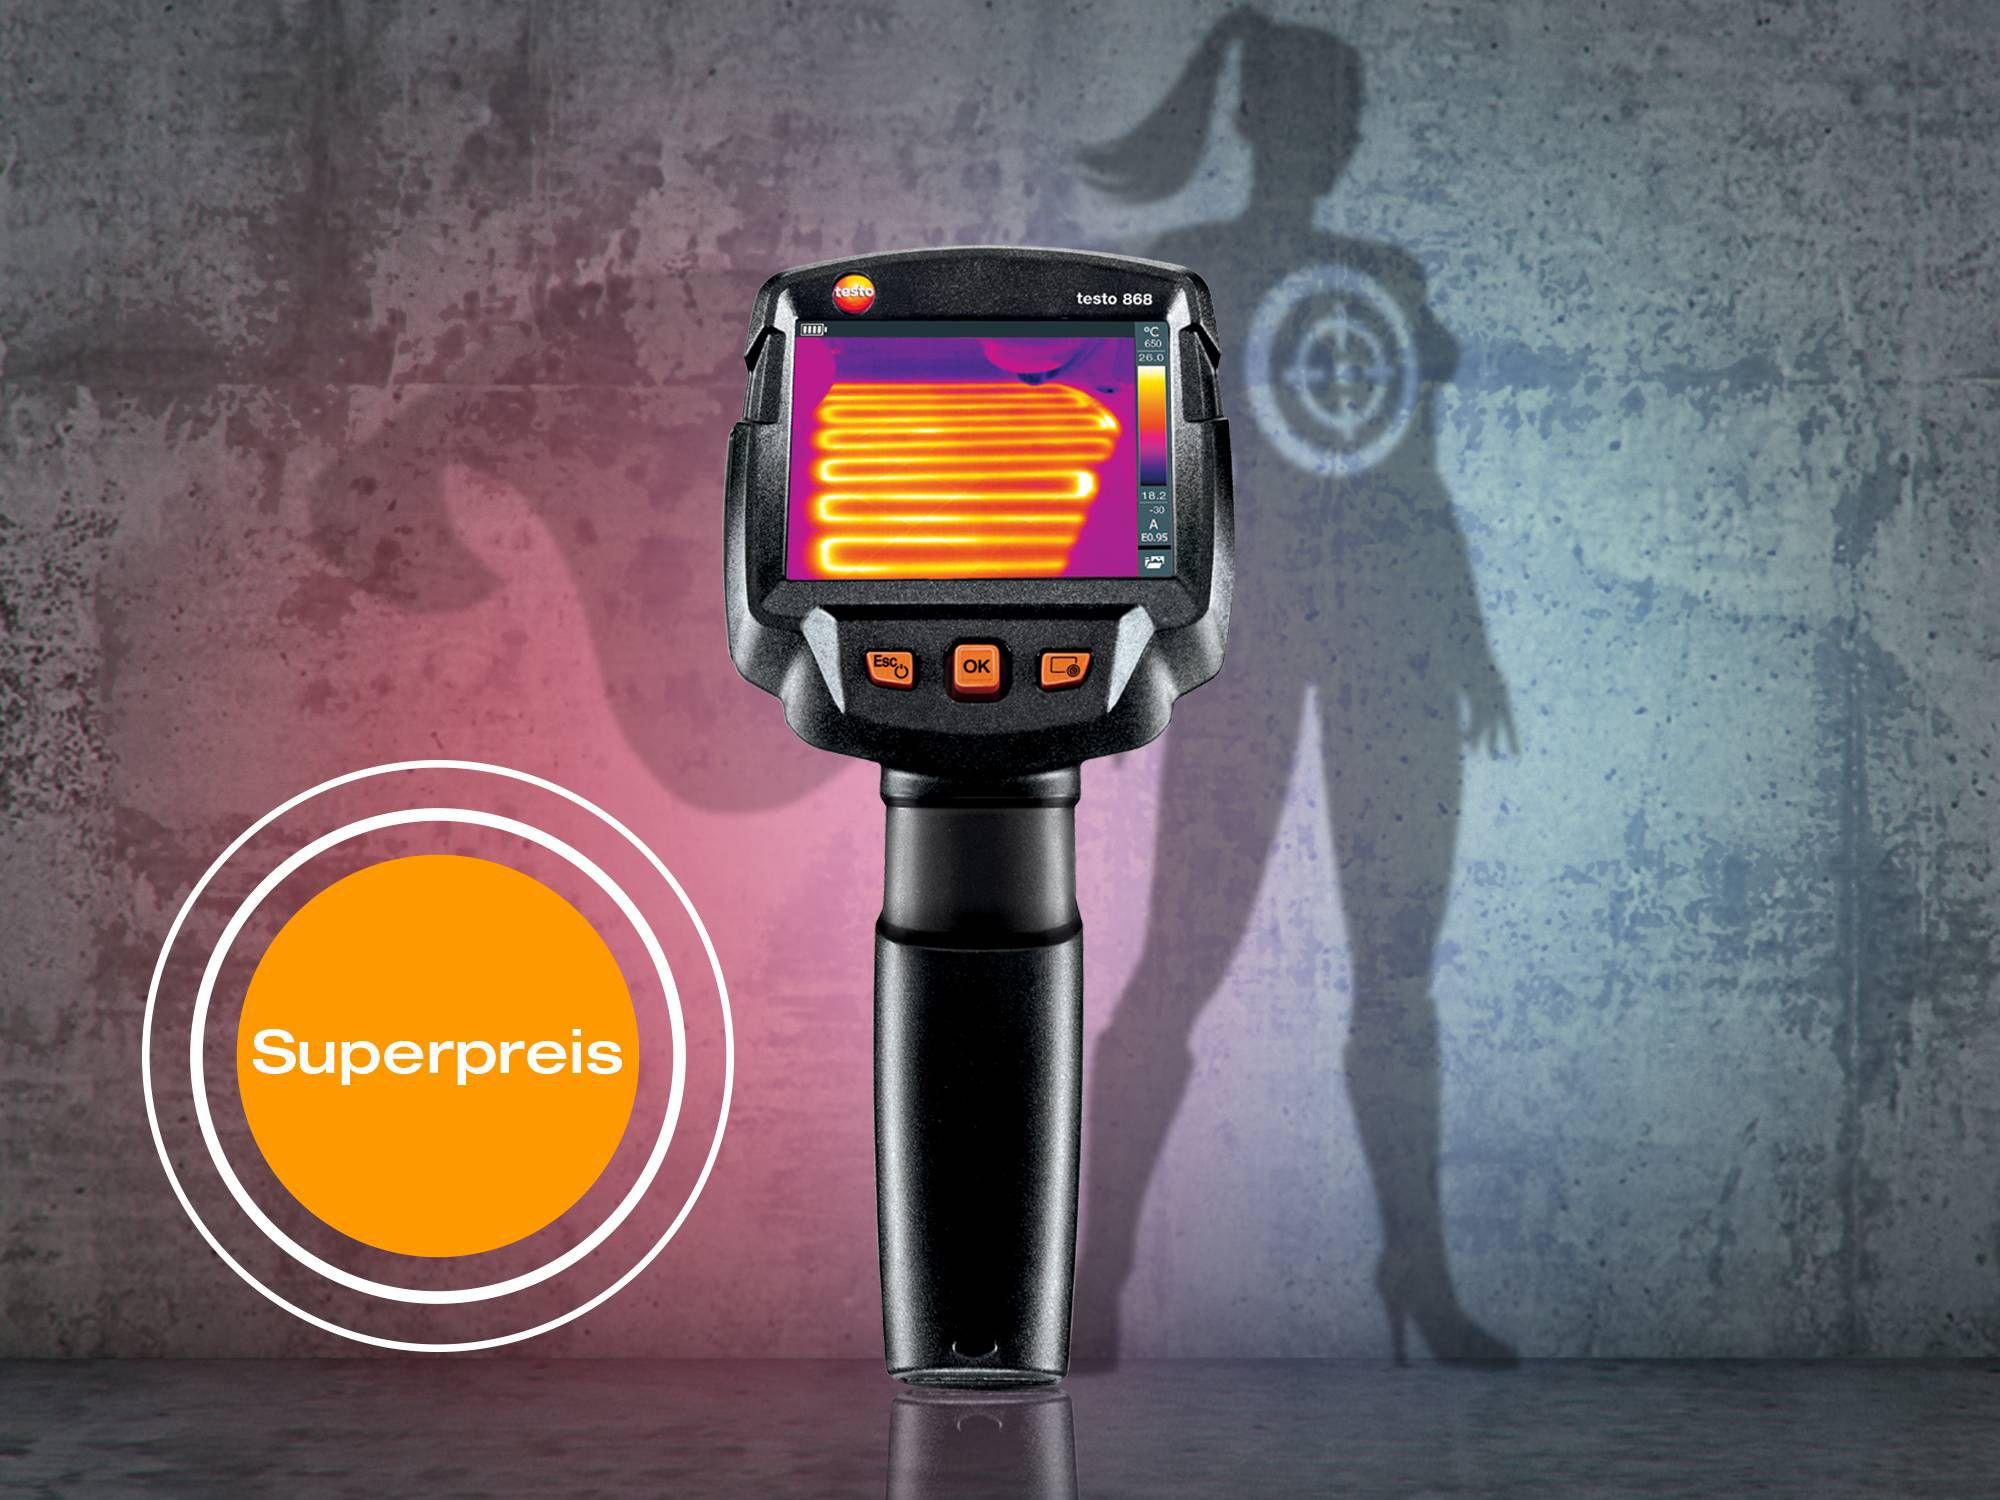 Wärmebildkamera testo 868